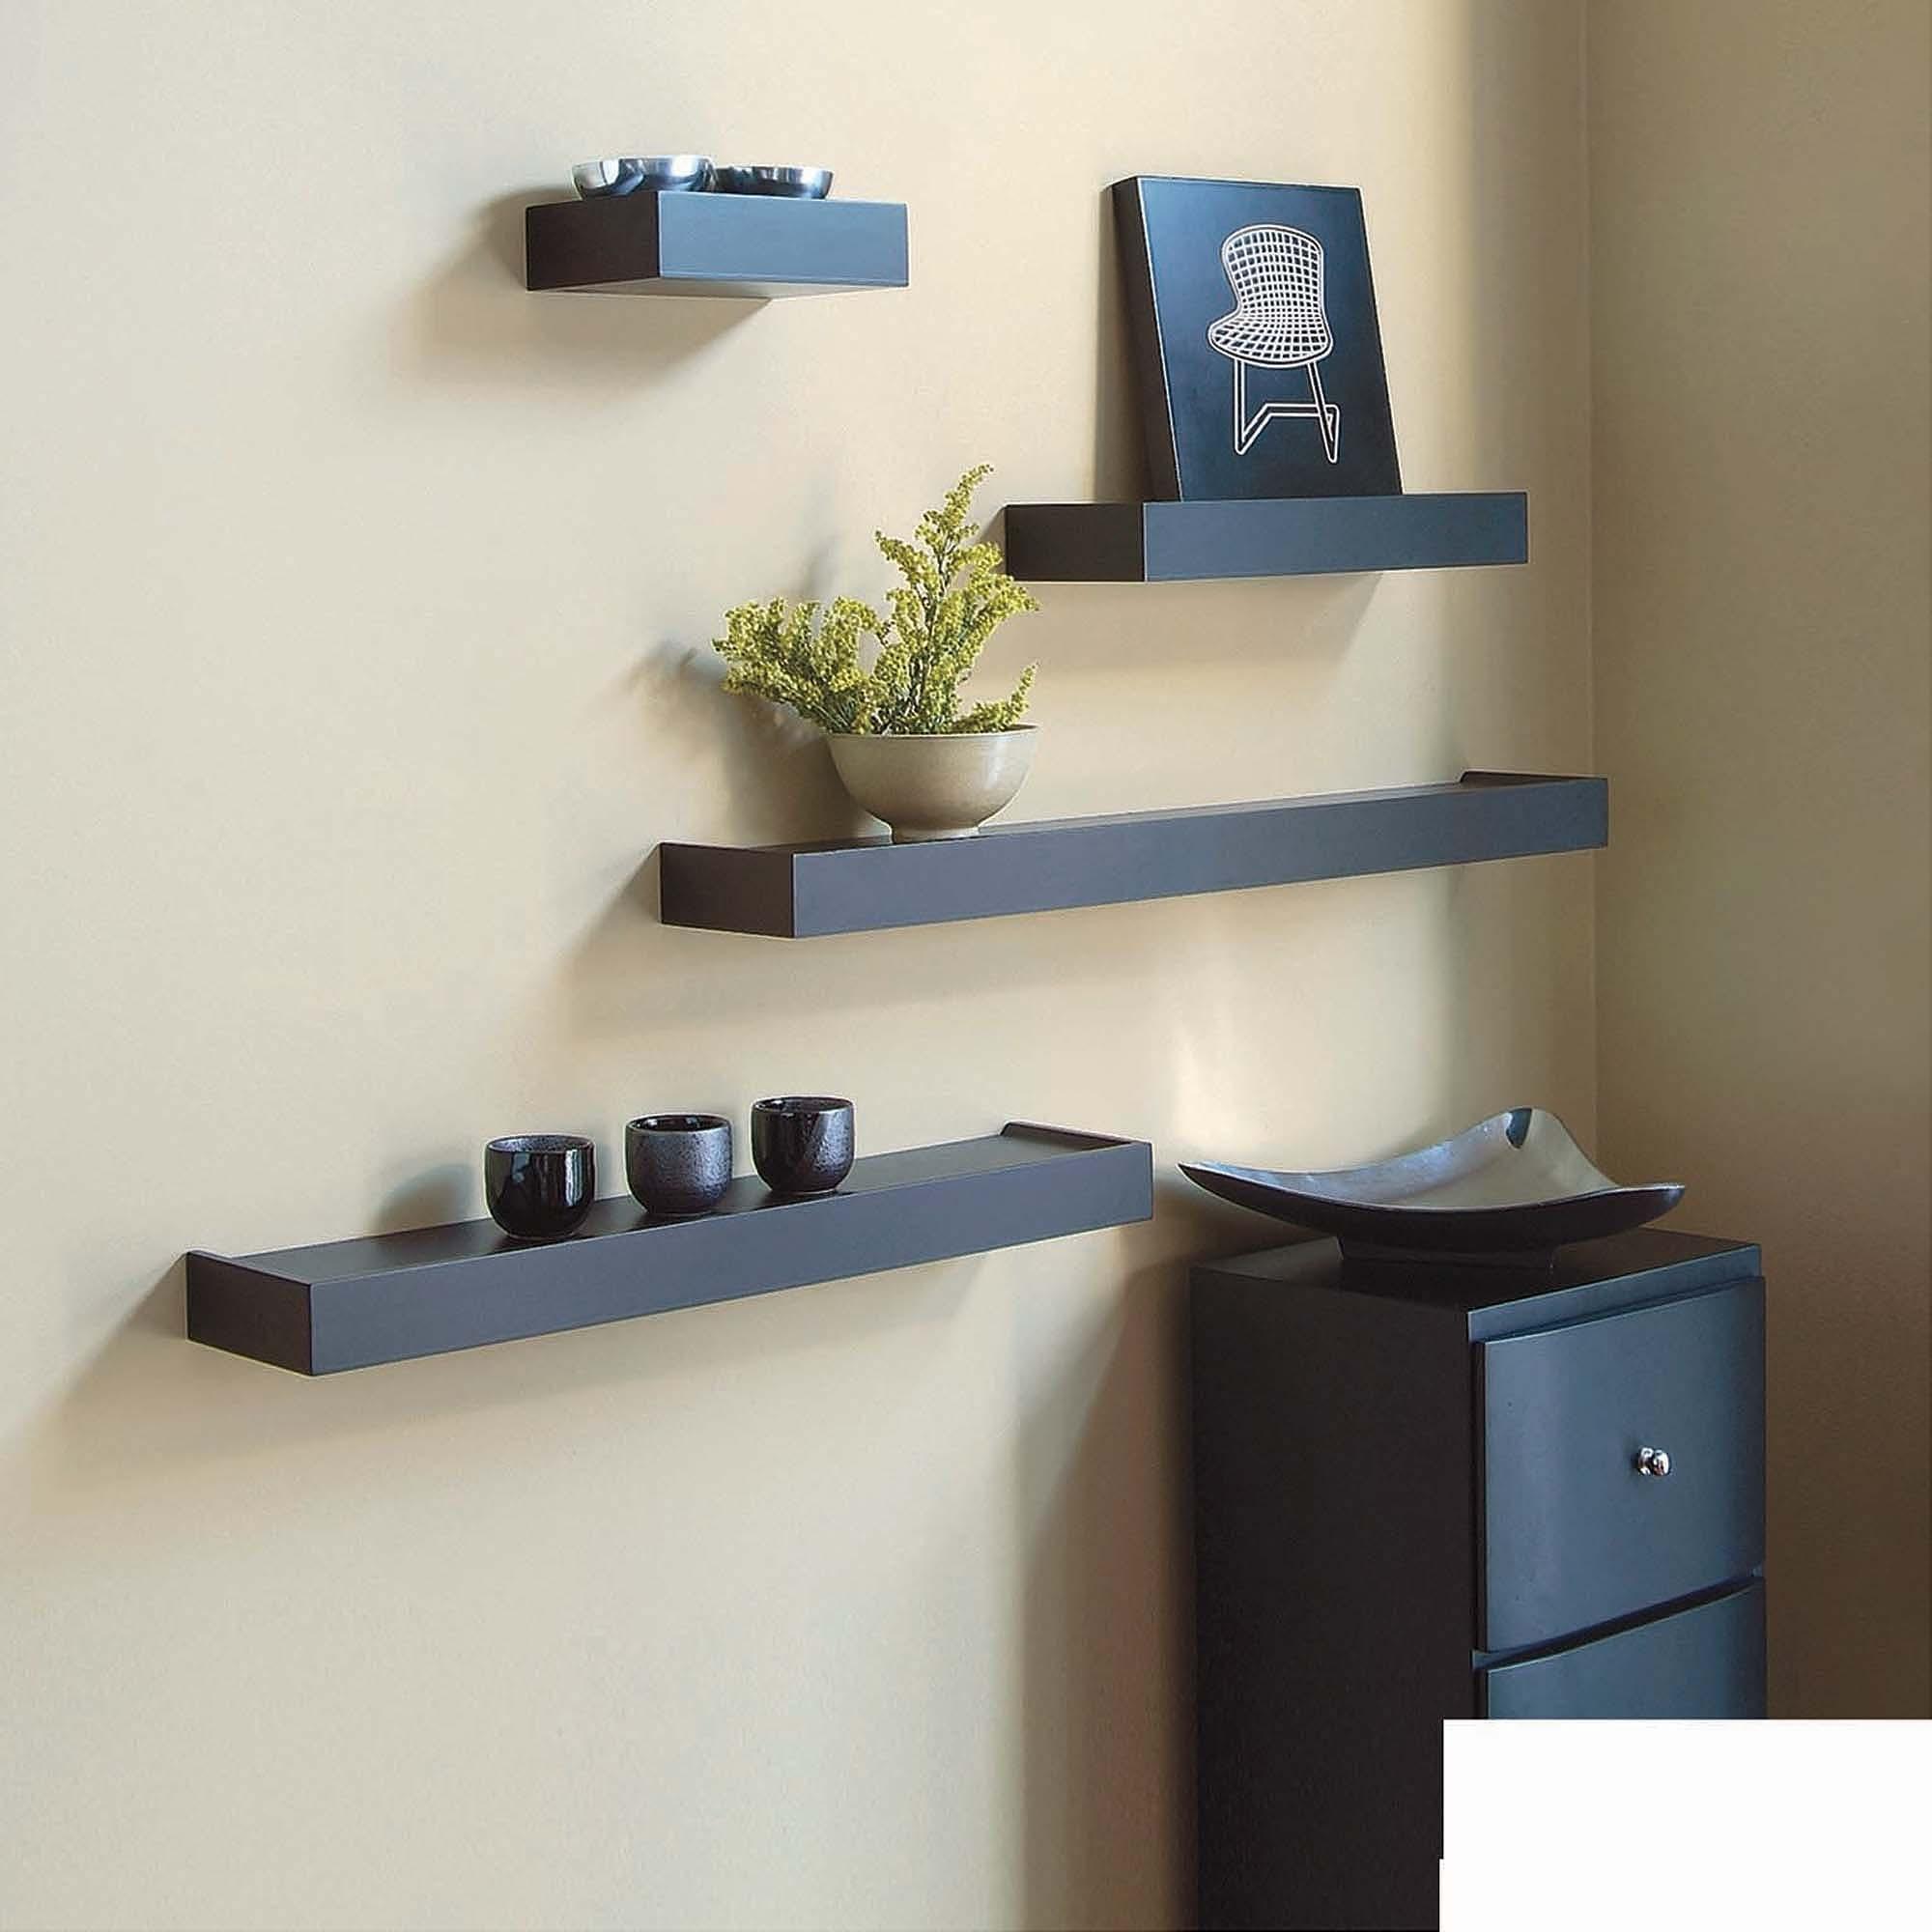 kiera grace vertigo set of 4 black wall shelves, 6 NAWUVXS